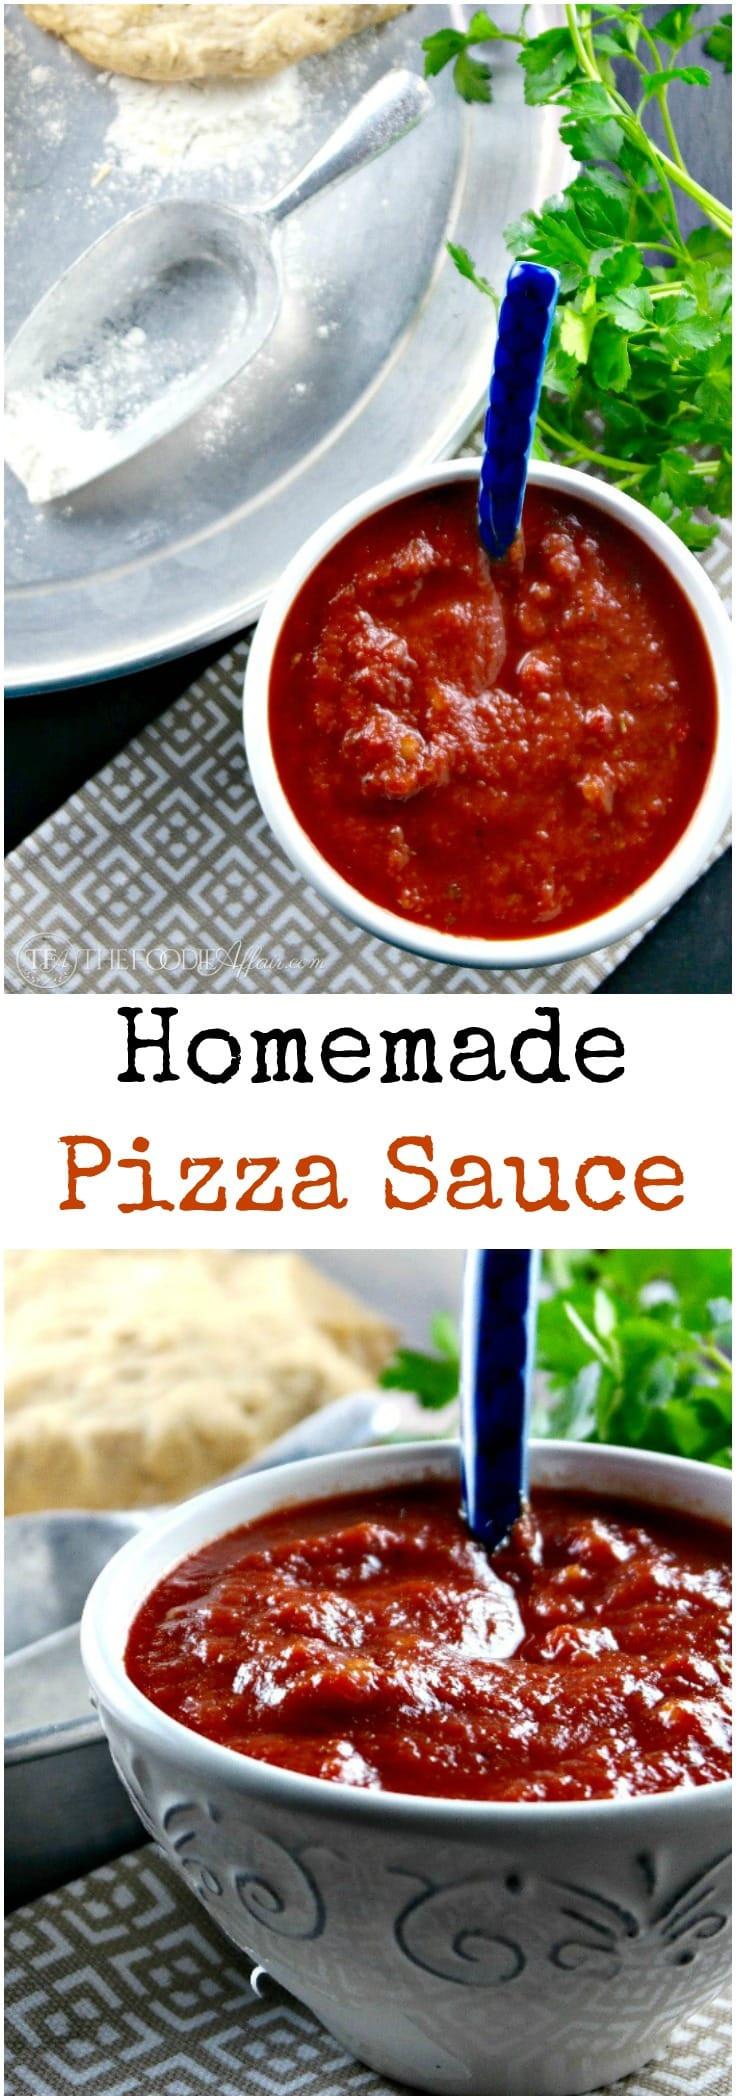 Italian Pizza Sauce Recipe  Homemade Pizza Sauce Recipe